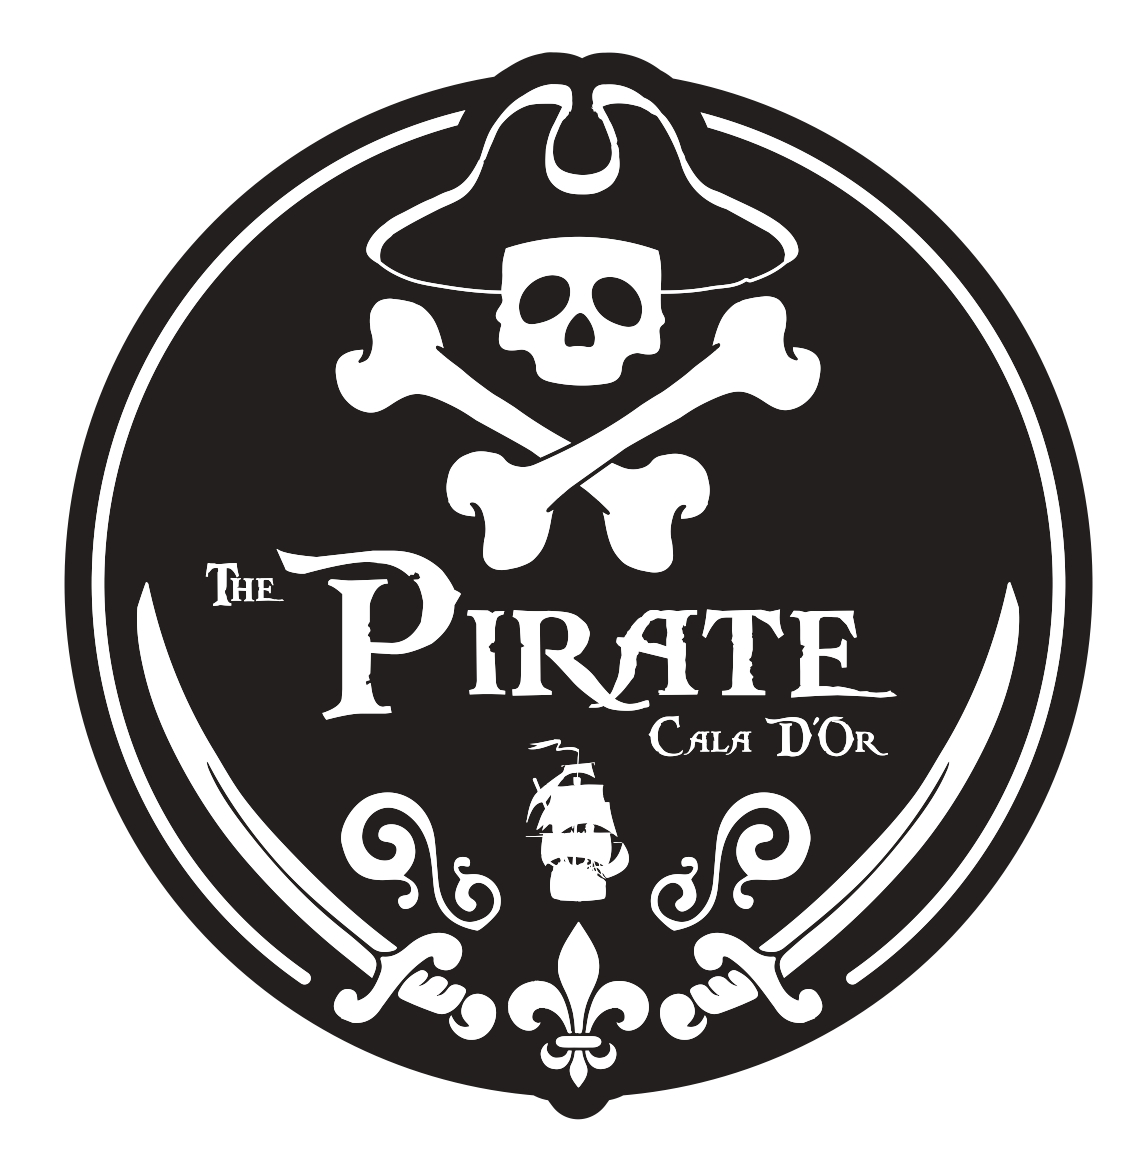 Restaurant The Pirate